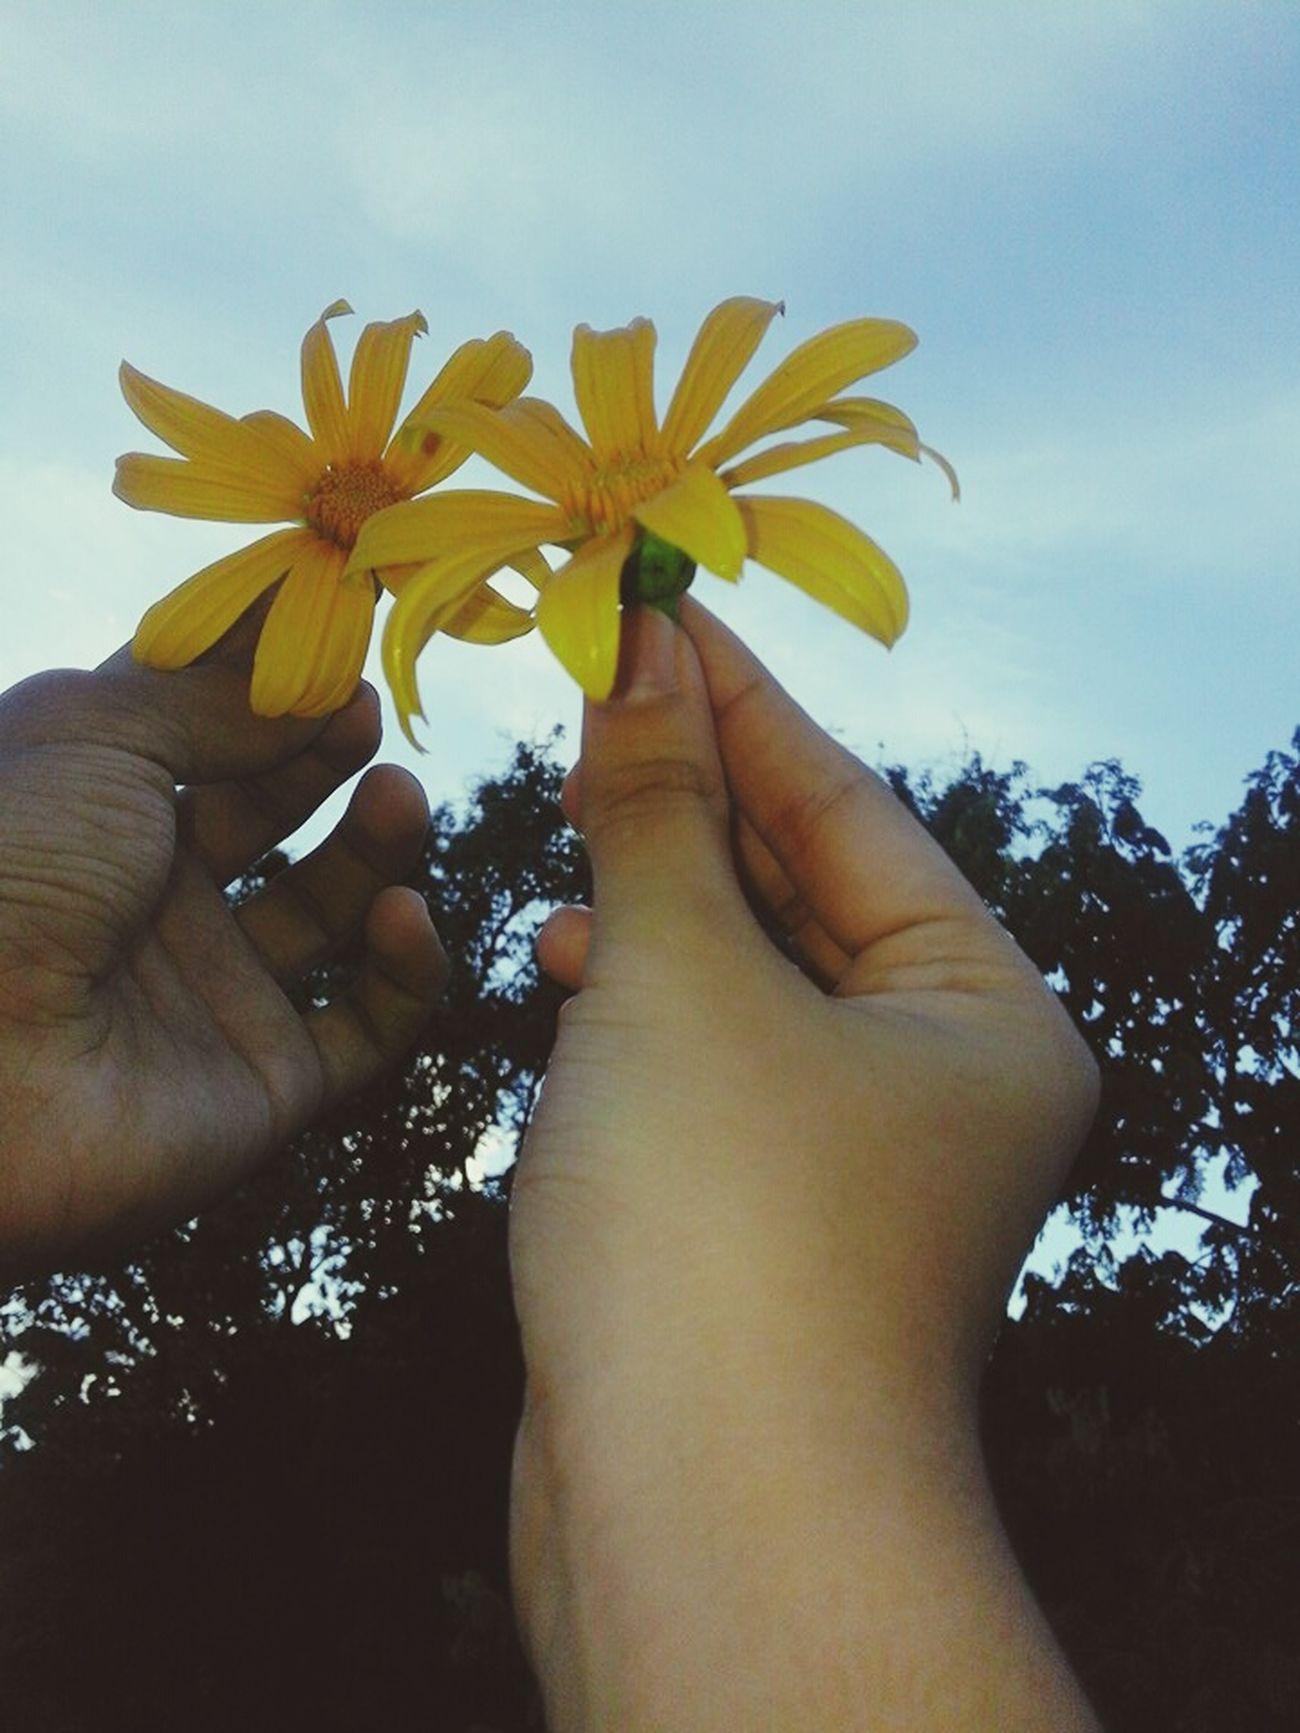 Flowerlovers Bae❤️ Earlier This Morning (: Yellow Flowers